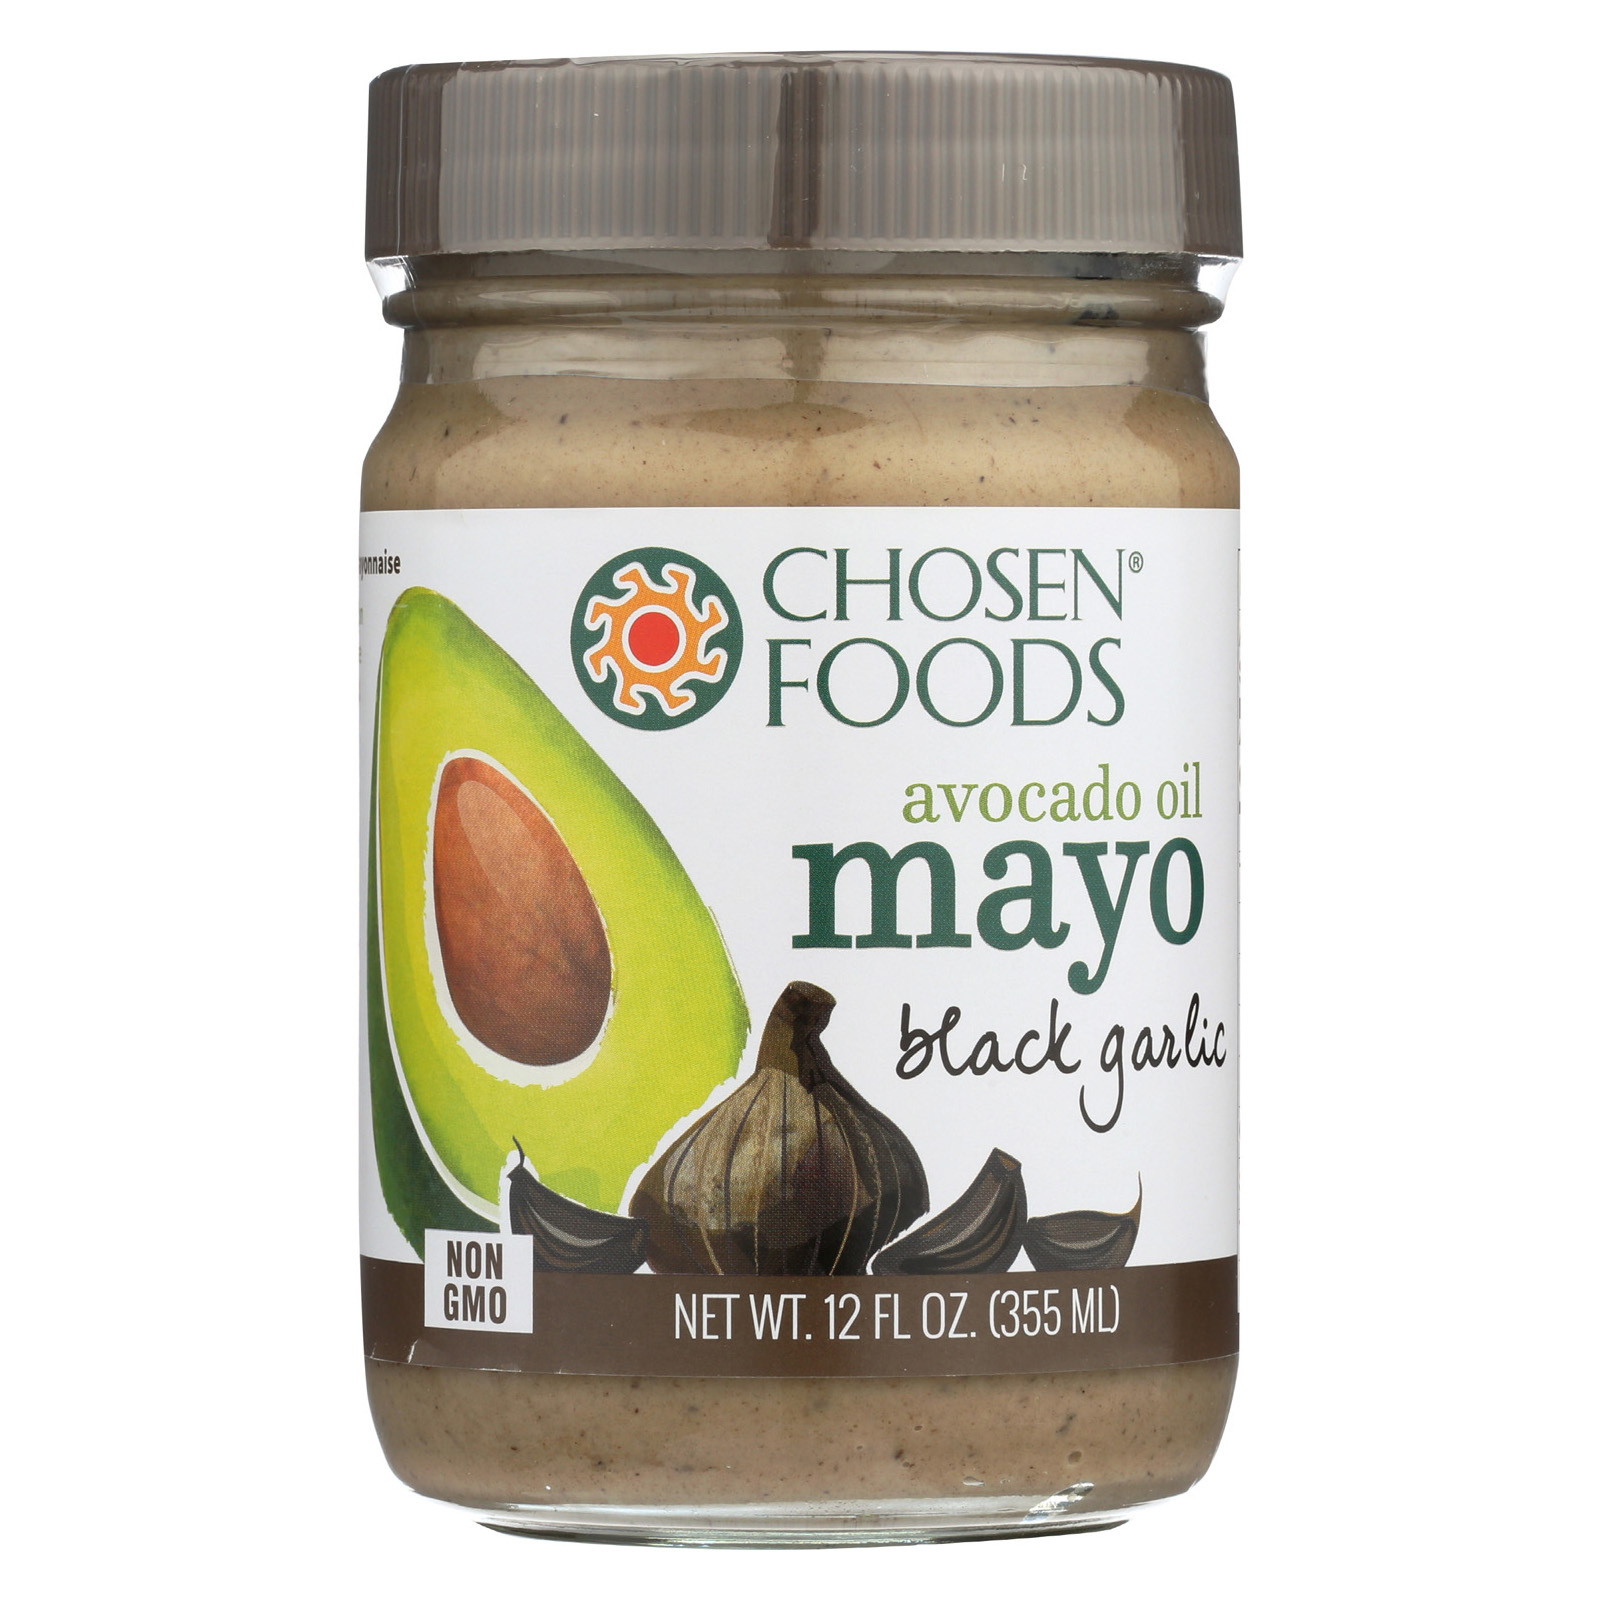 Chosen Foods Avocado Oil Mayo - Black Garlic - Case of 6 - 12 oz